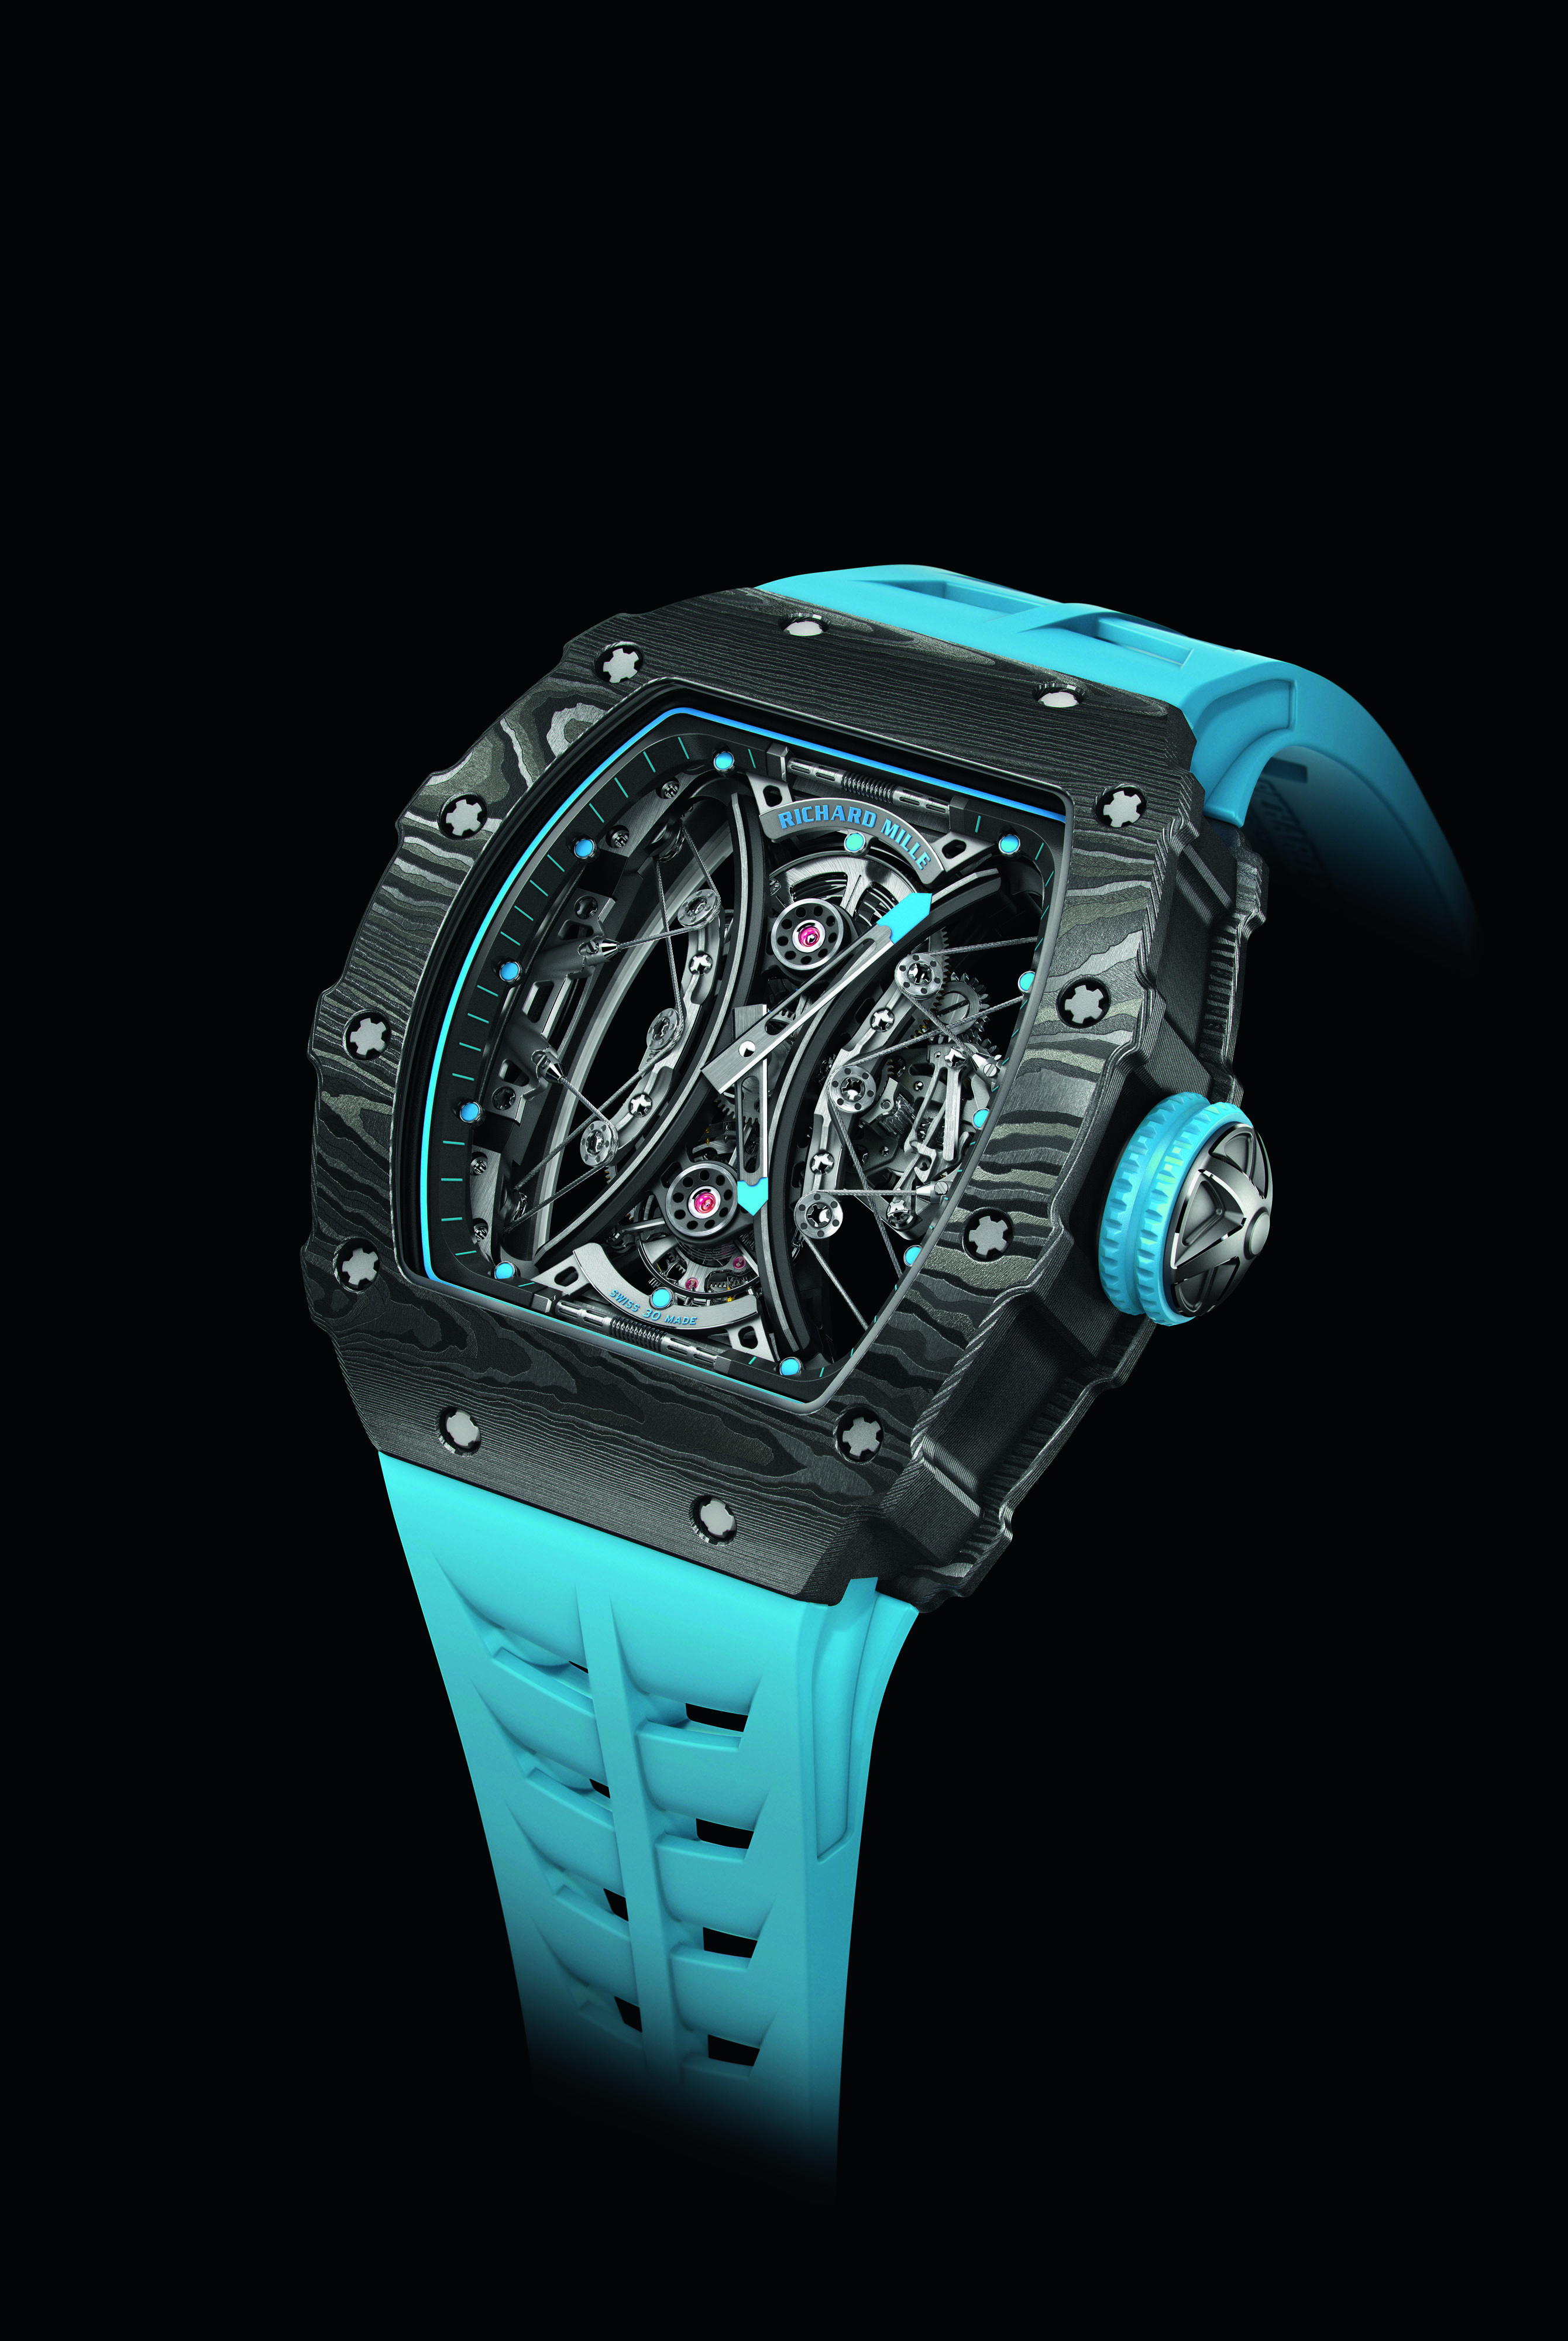 RM 53 01 TOURBILLON PABLO MAC DONOUGH orologi sihh 2018